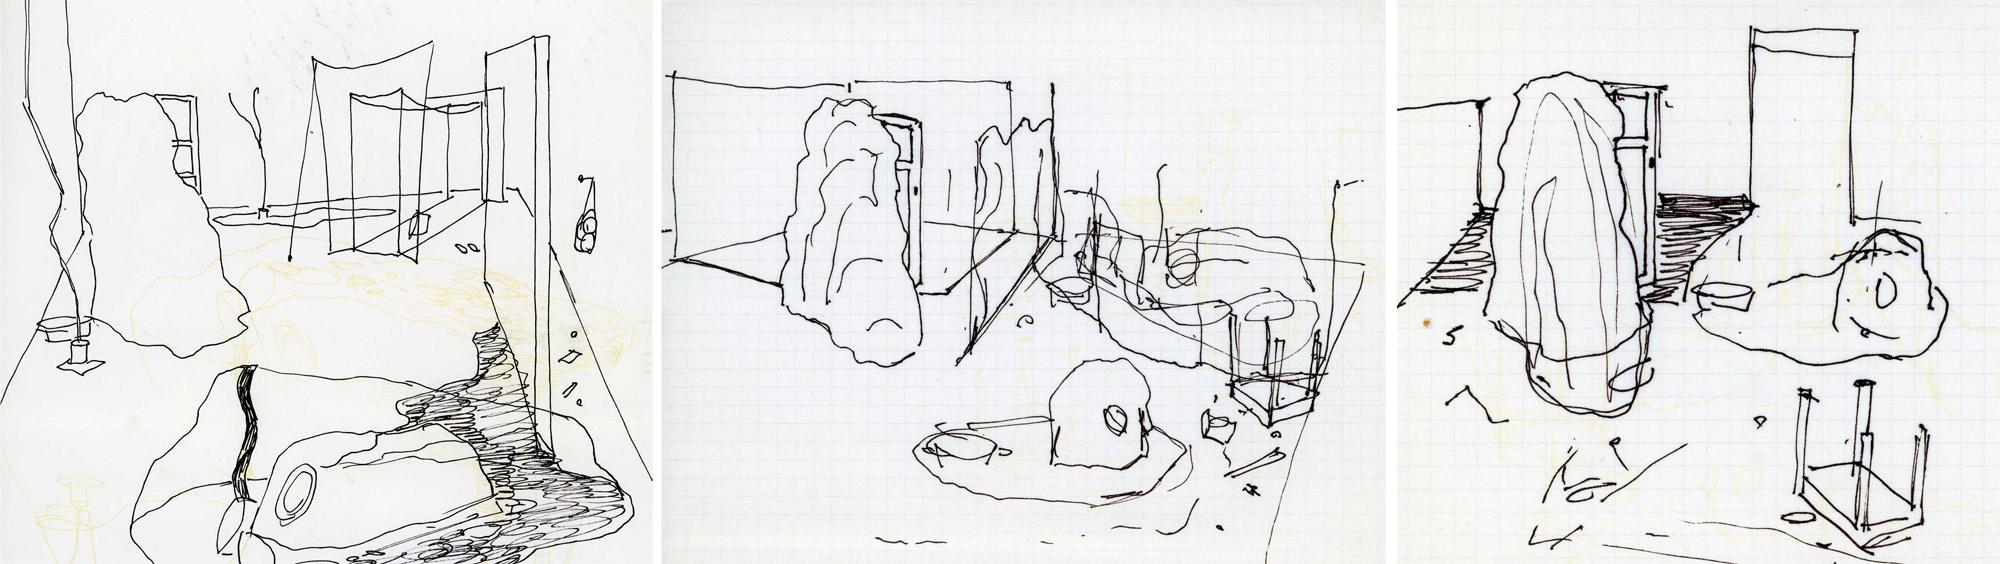 maddy arkesteyn sketches stedelijk museum